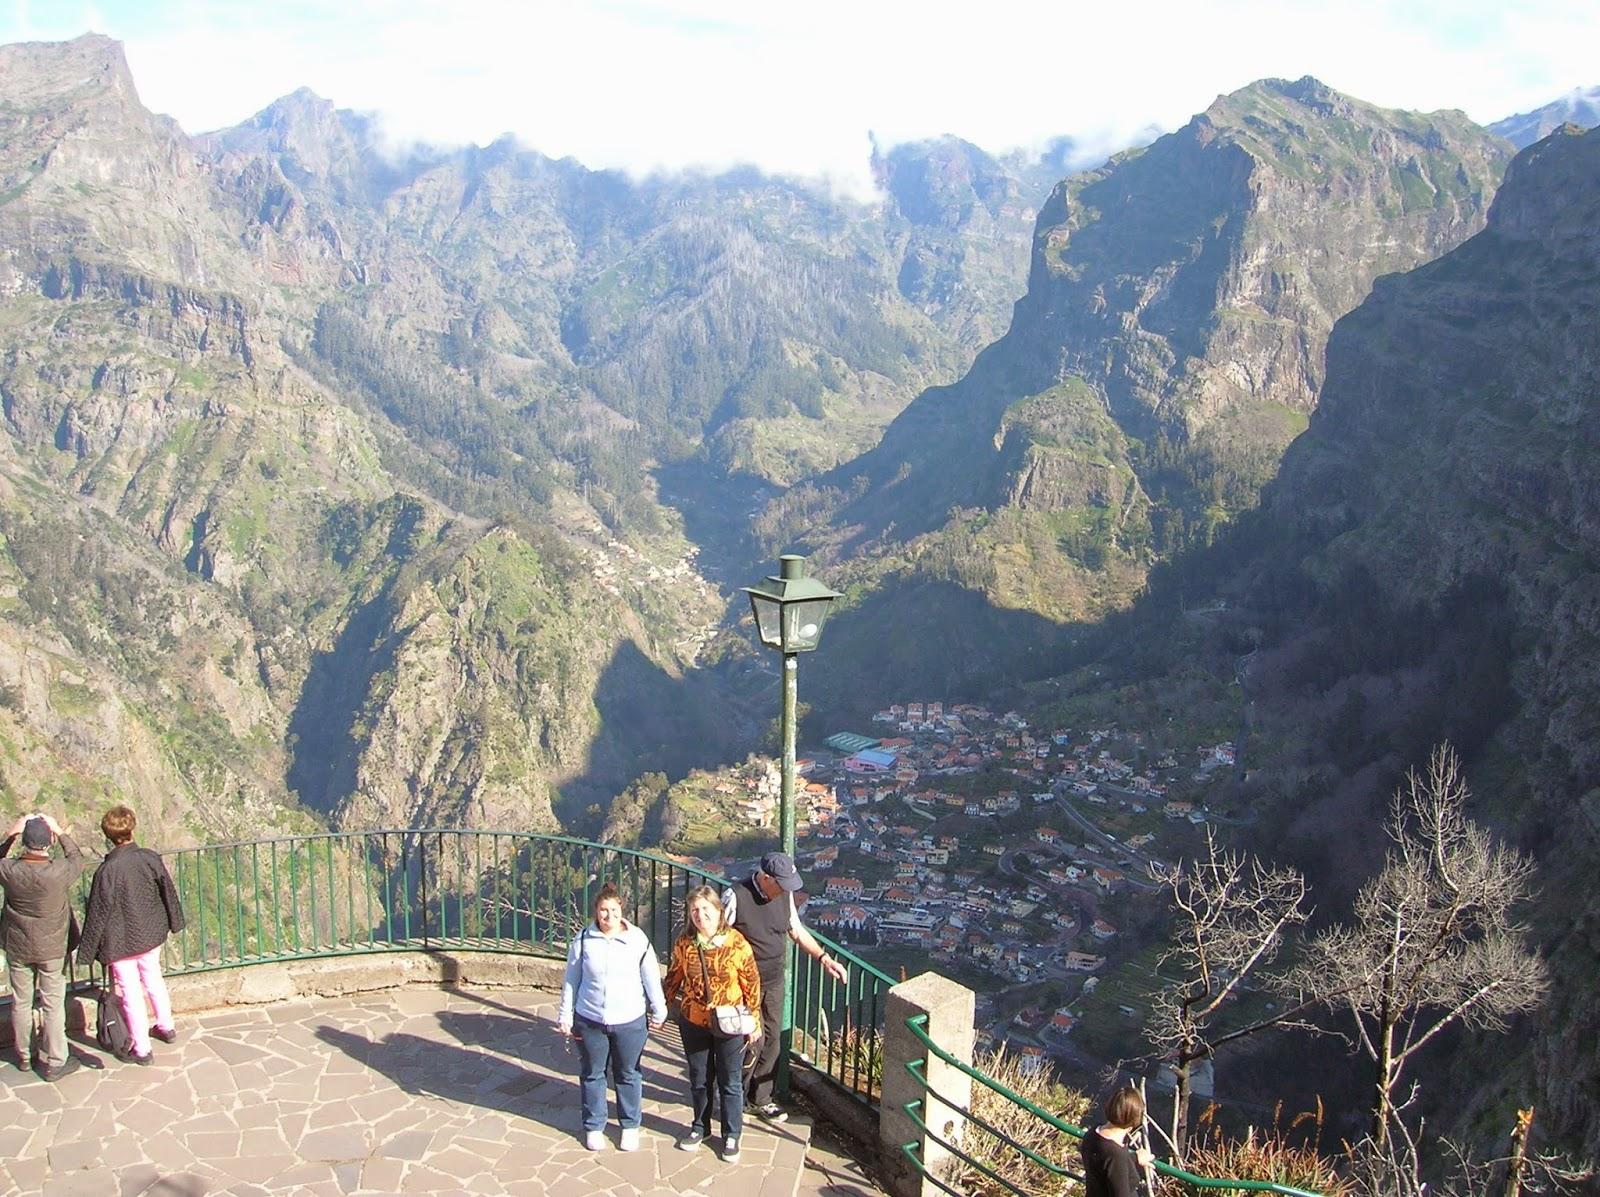 Mirador Curral das Feiras, Madeira, Portugal, La vuelta al mundo de Asun y Ricardo, round the world, mundoporlibre.com